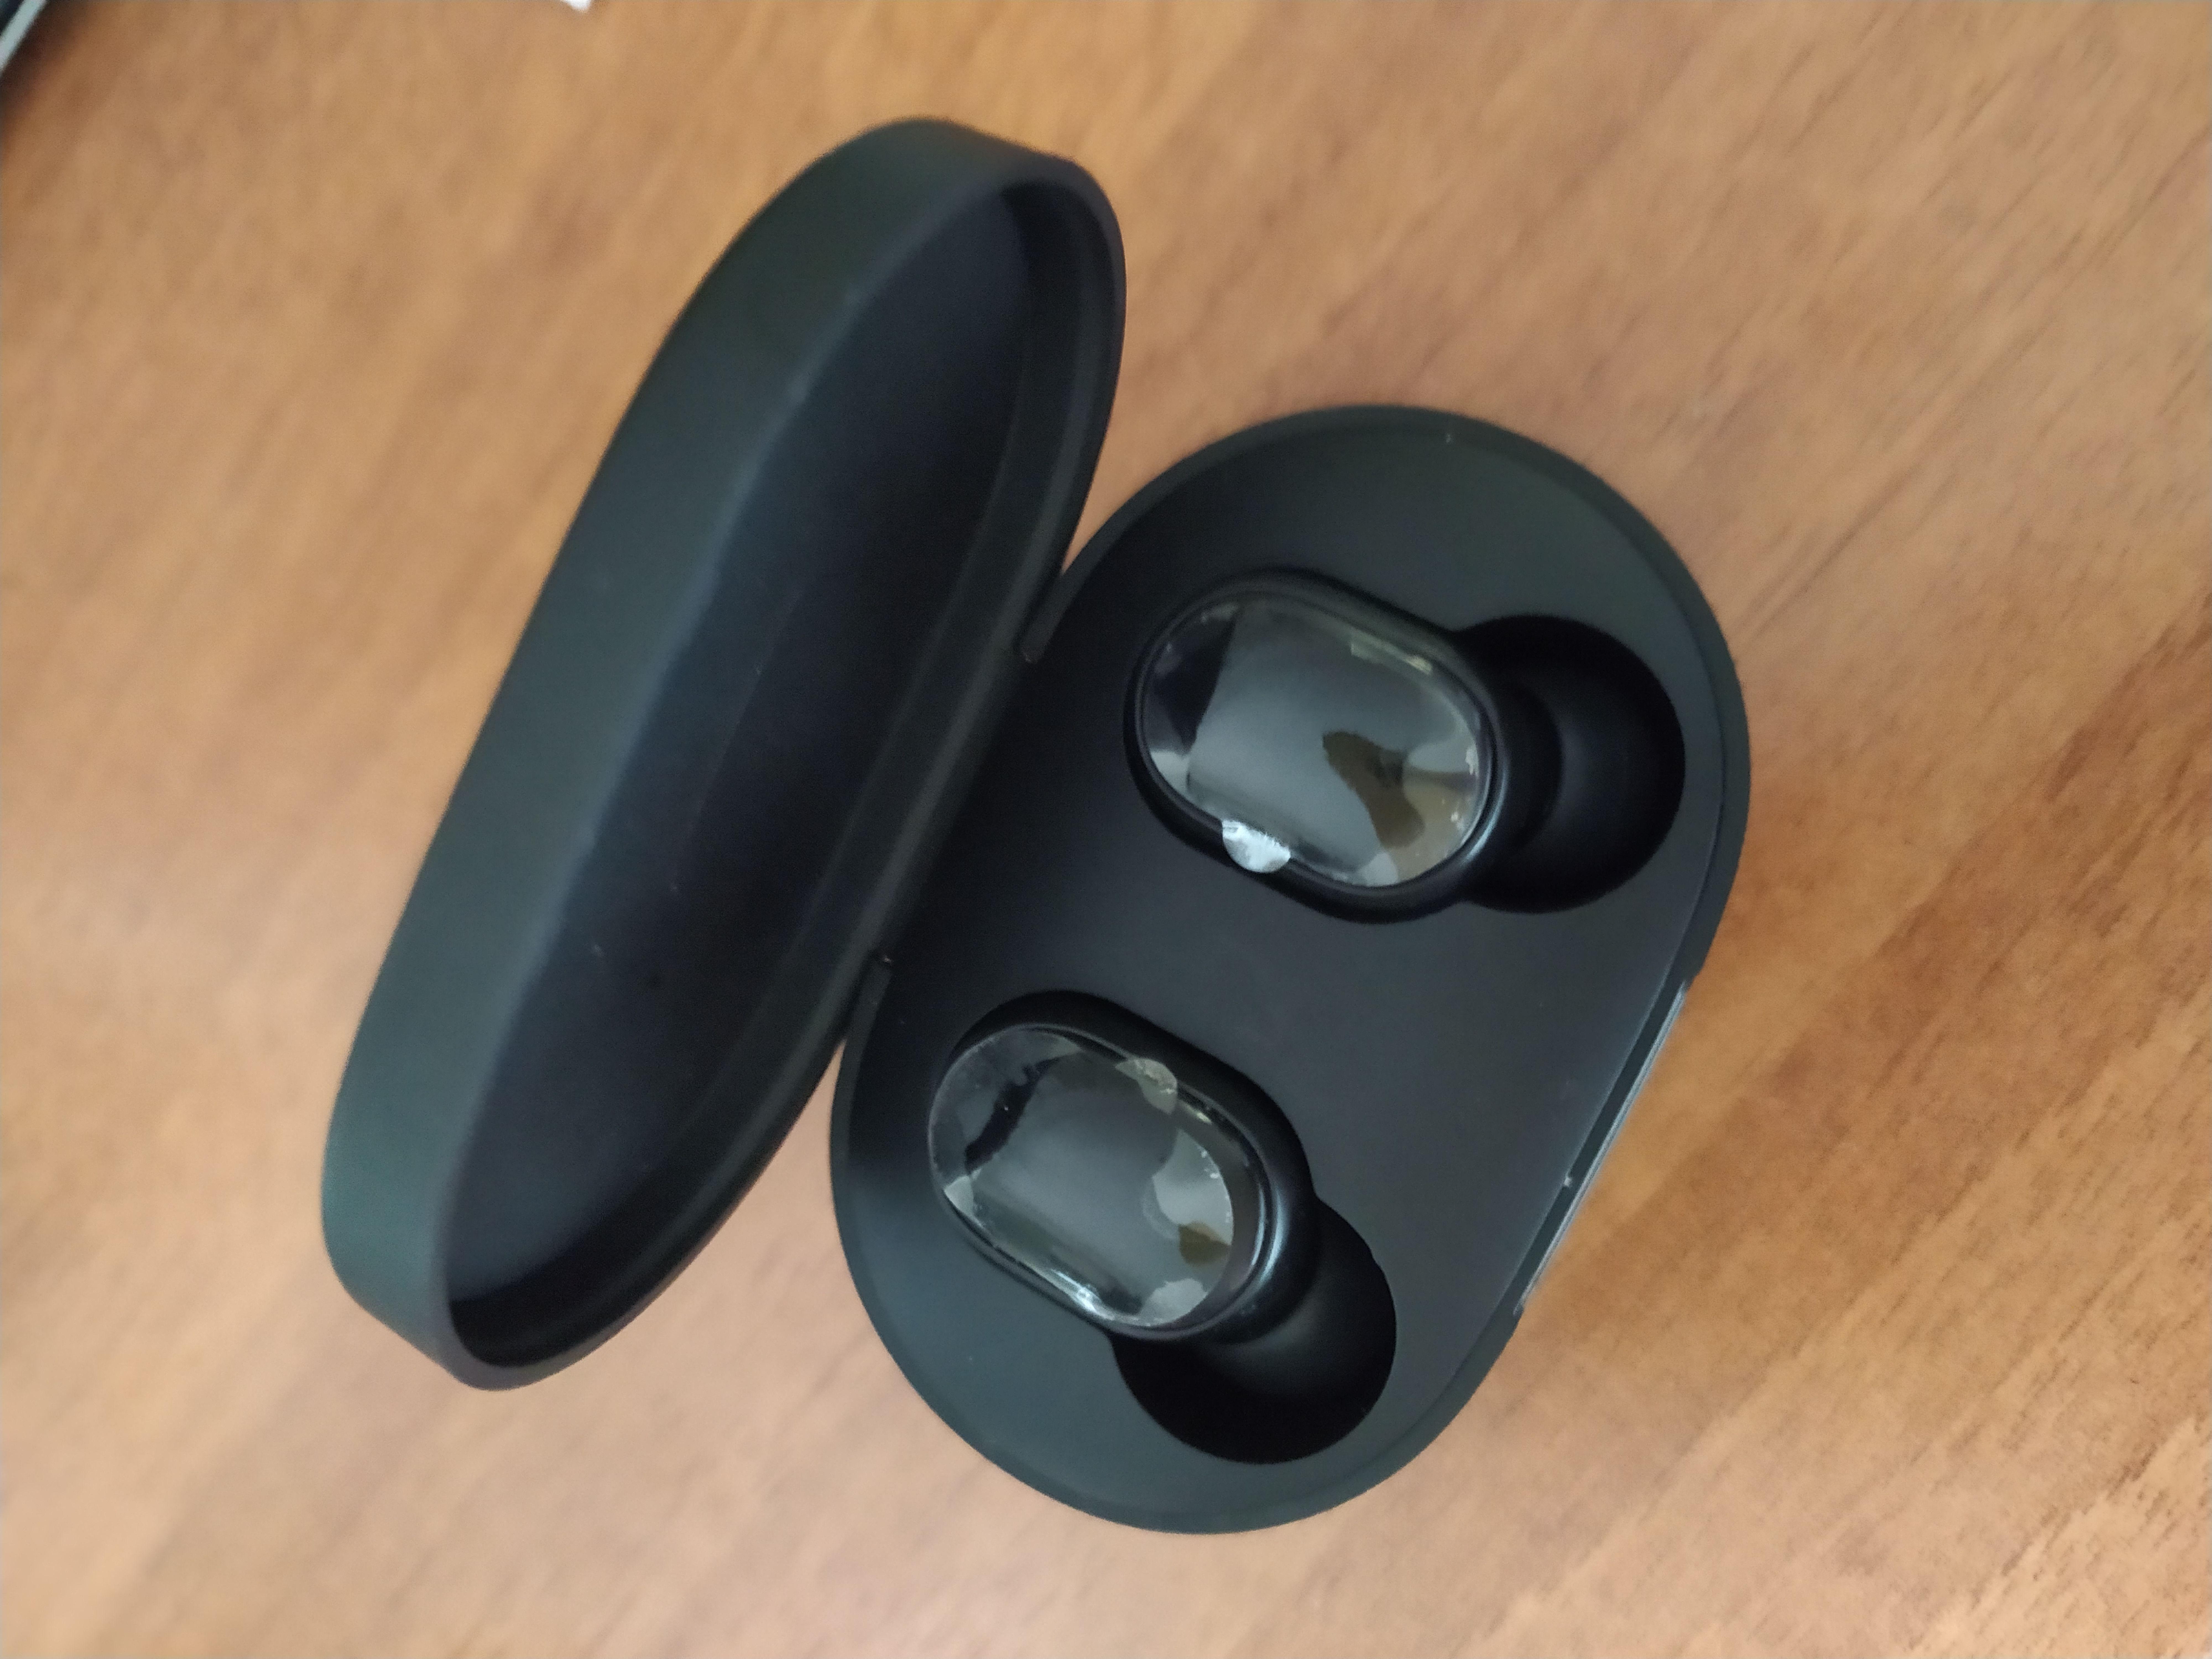 Redmi Airdots Auricolare Wireless Nero